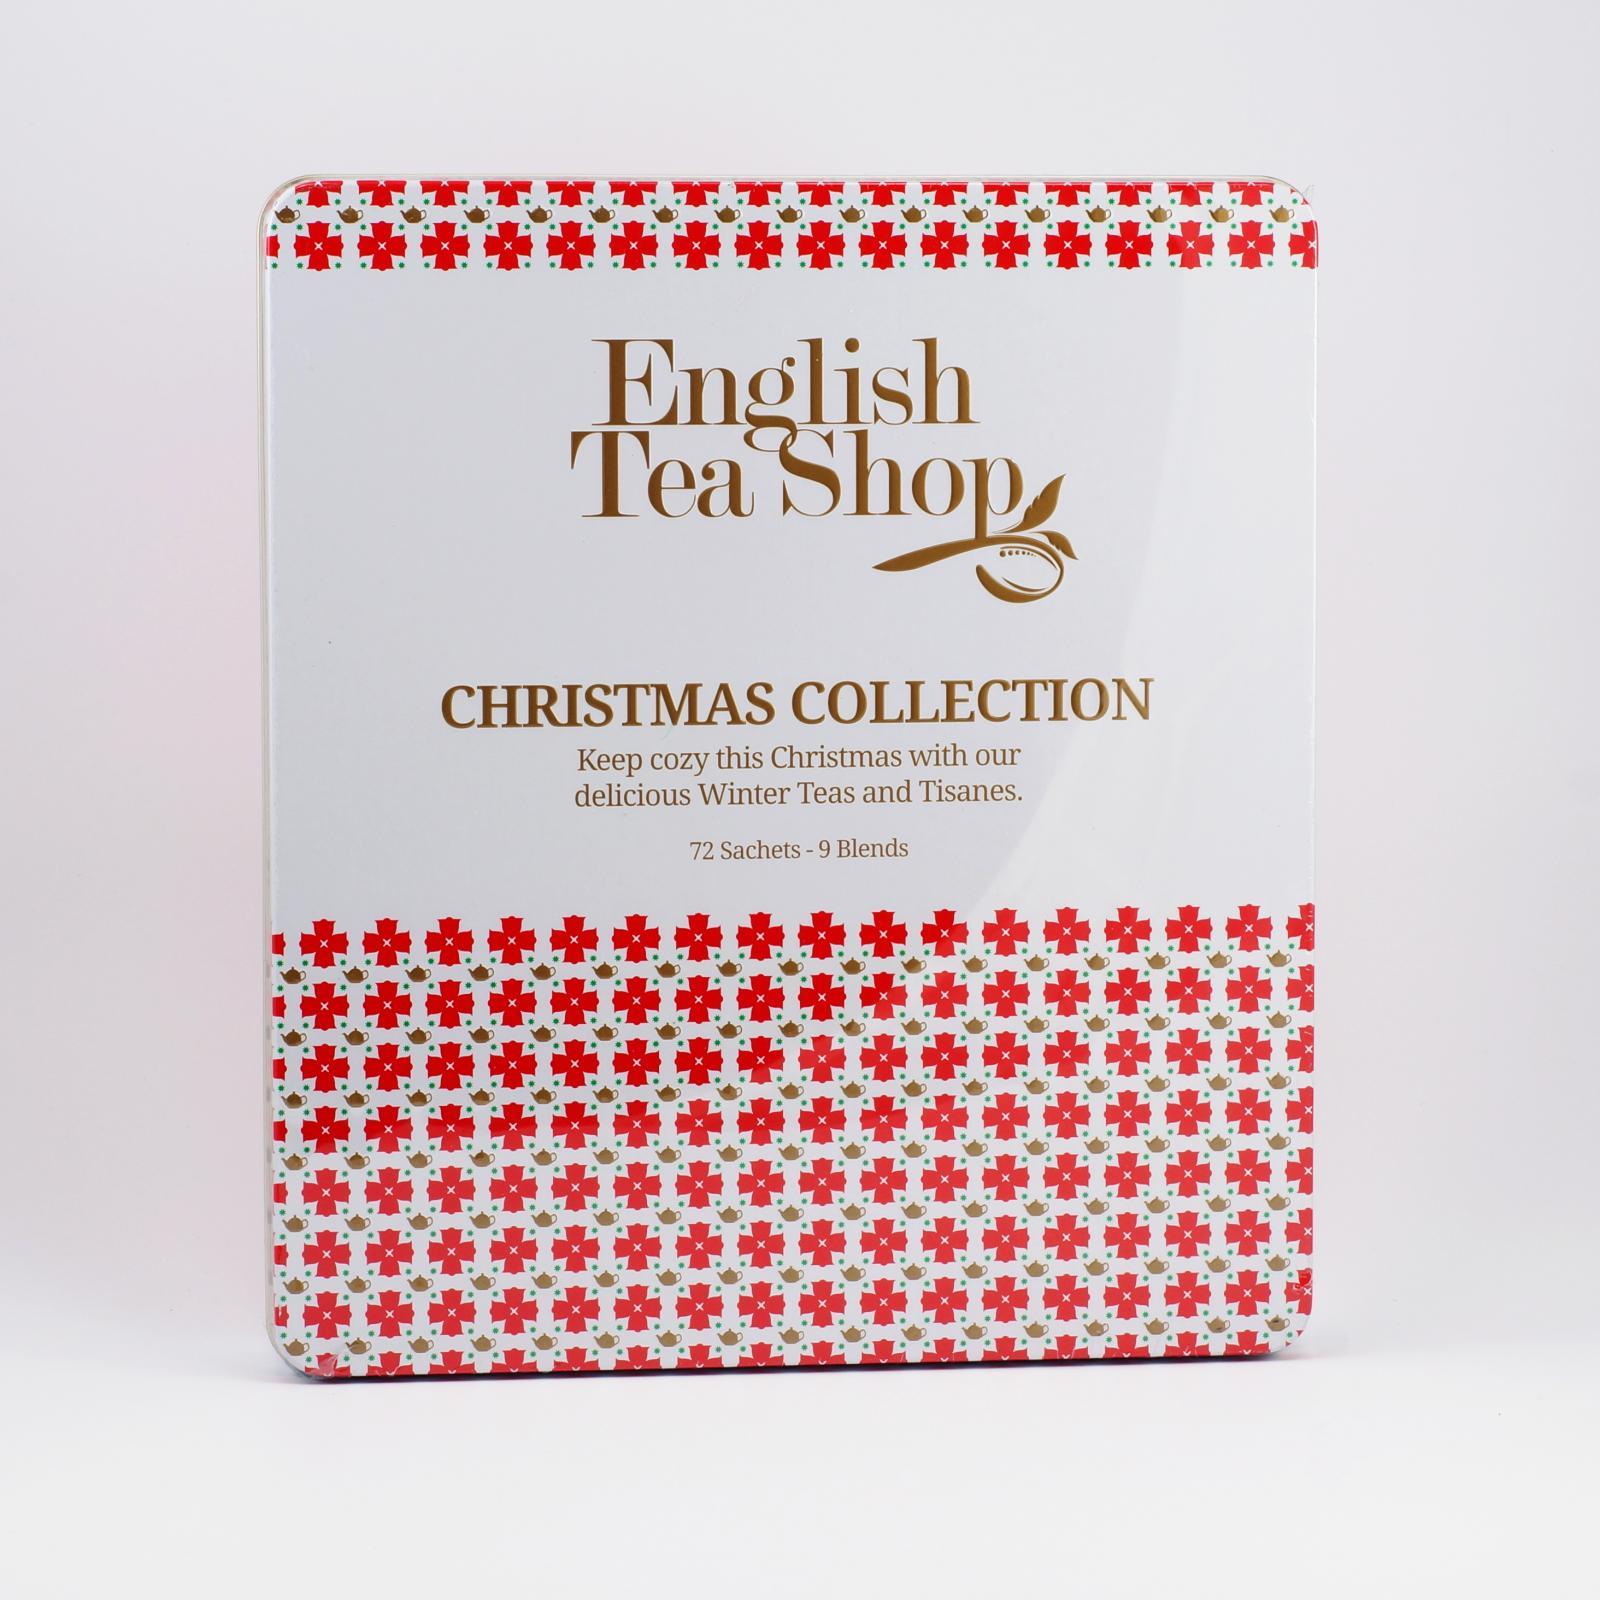 English Tea Shop Bílé Vánoce, plechová kazeta 72 ks, 108 g